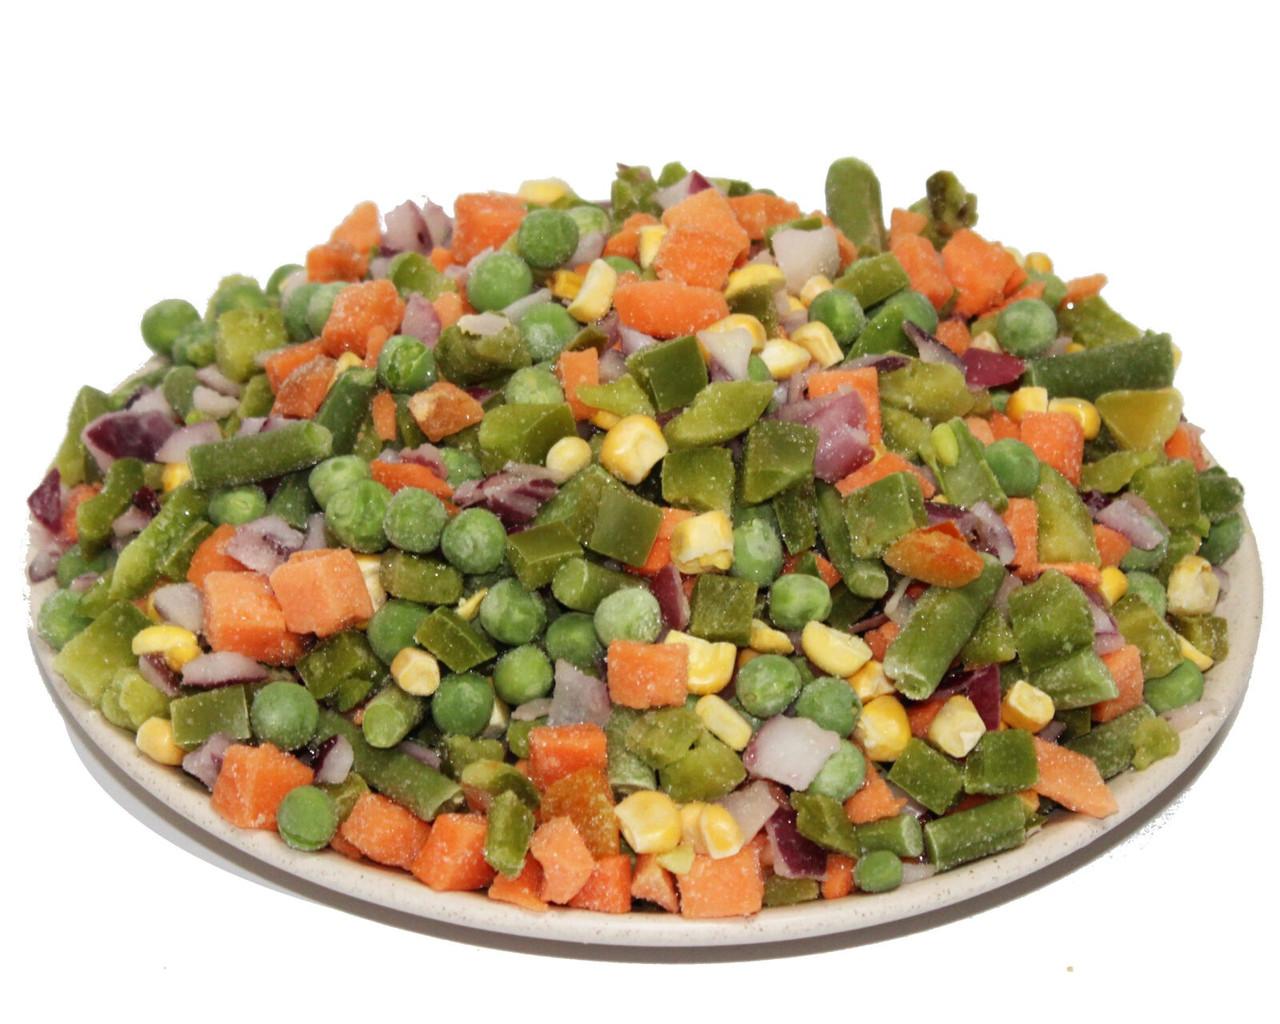 Андалузская смесь овощная (лук репчатый, перец,кукуруза, спаржа,горох,морковка)